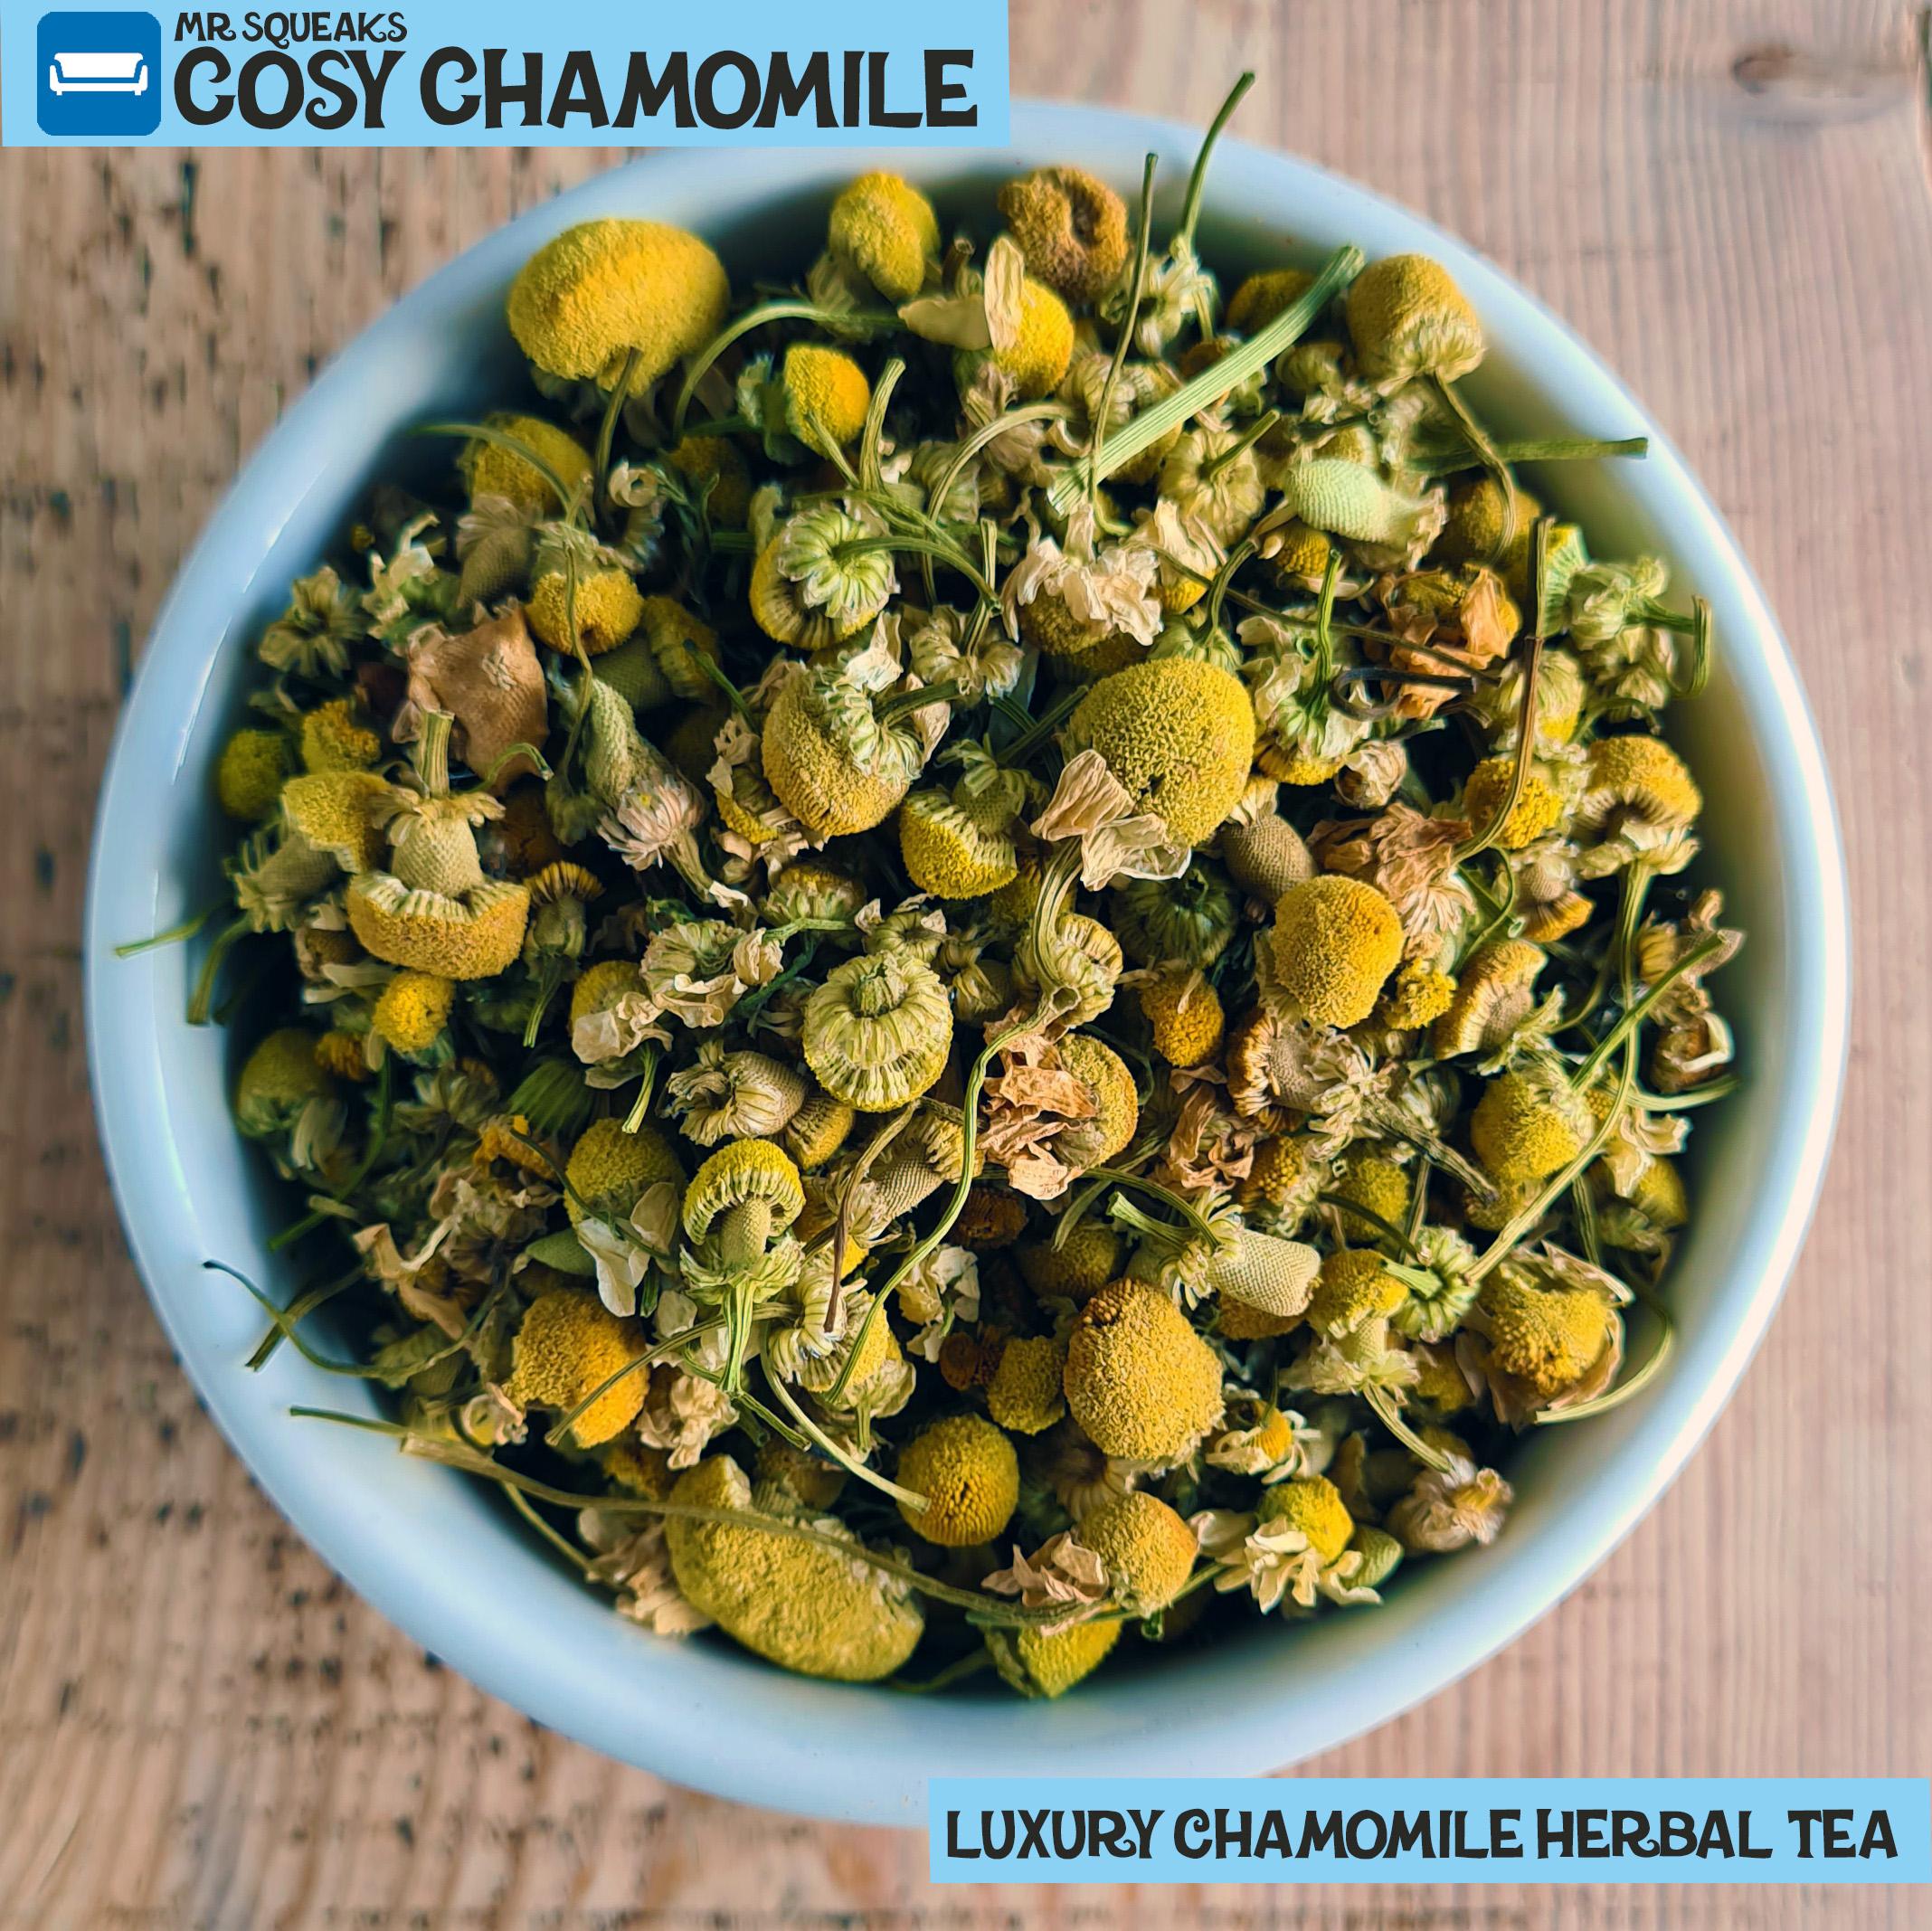 Cosy Chamomile